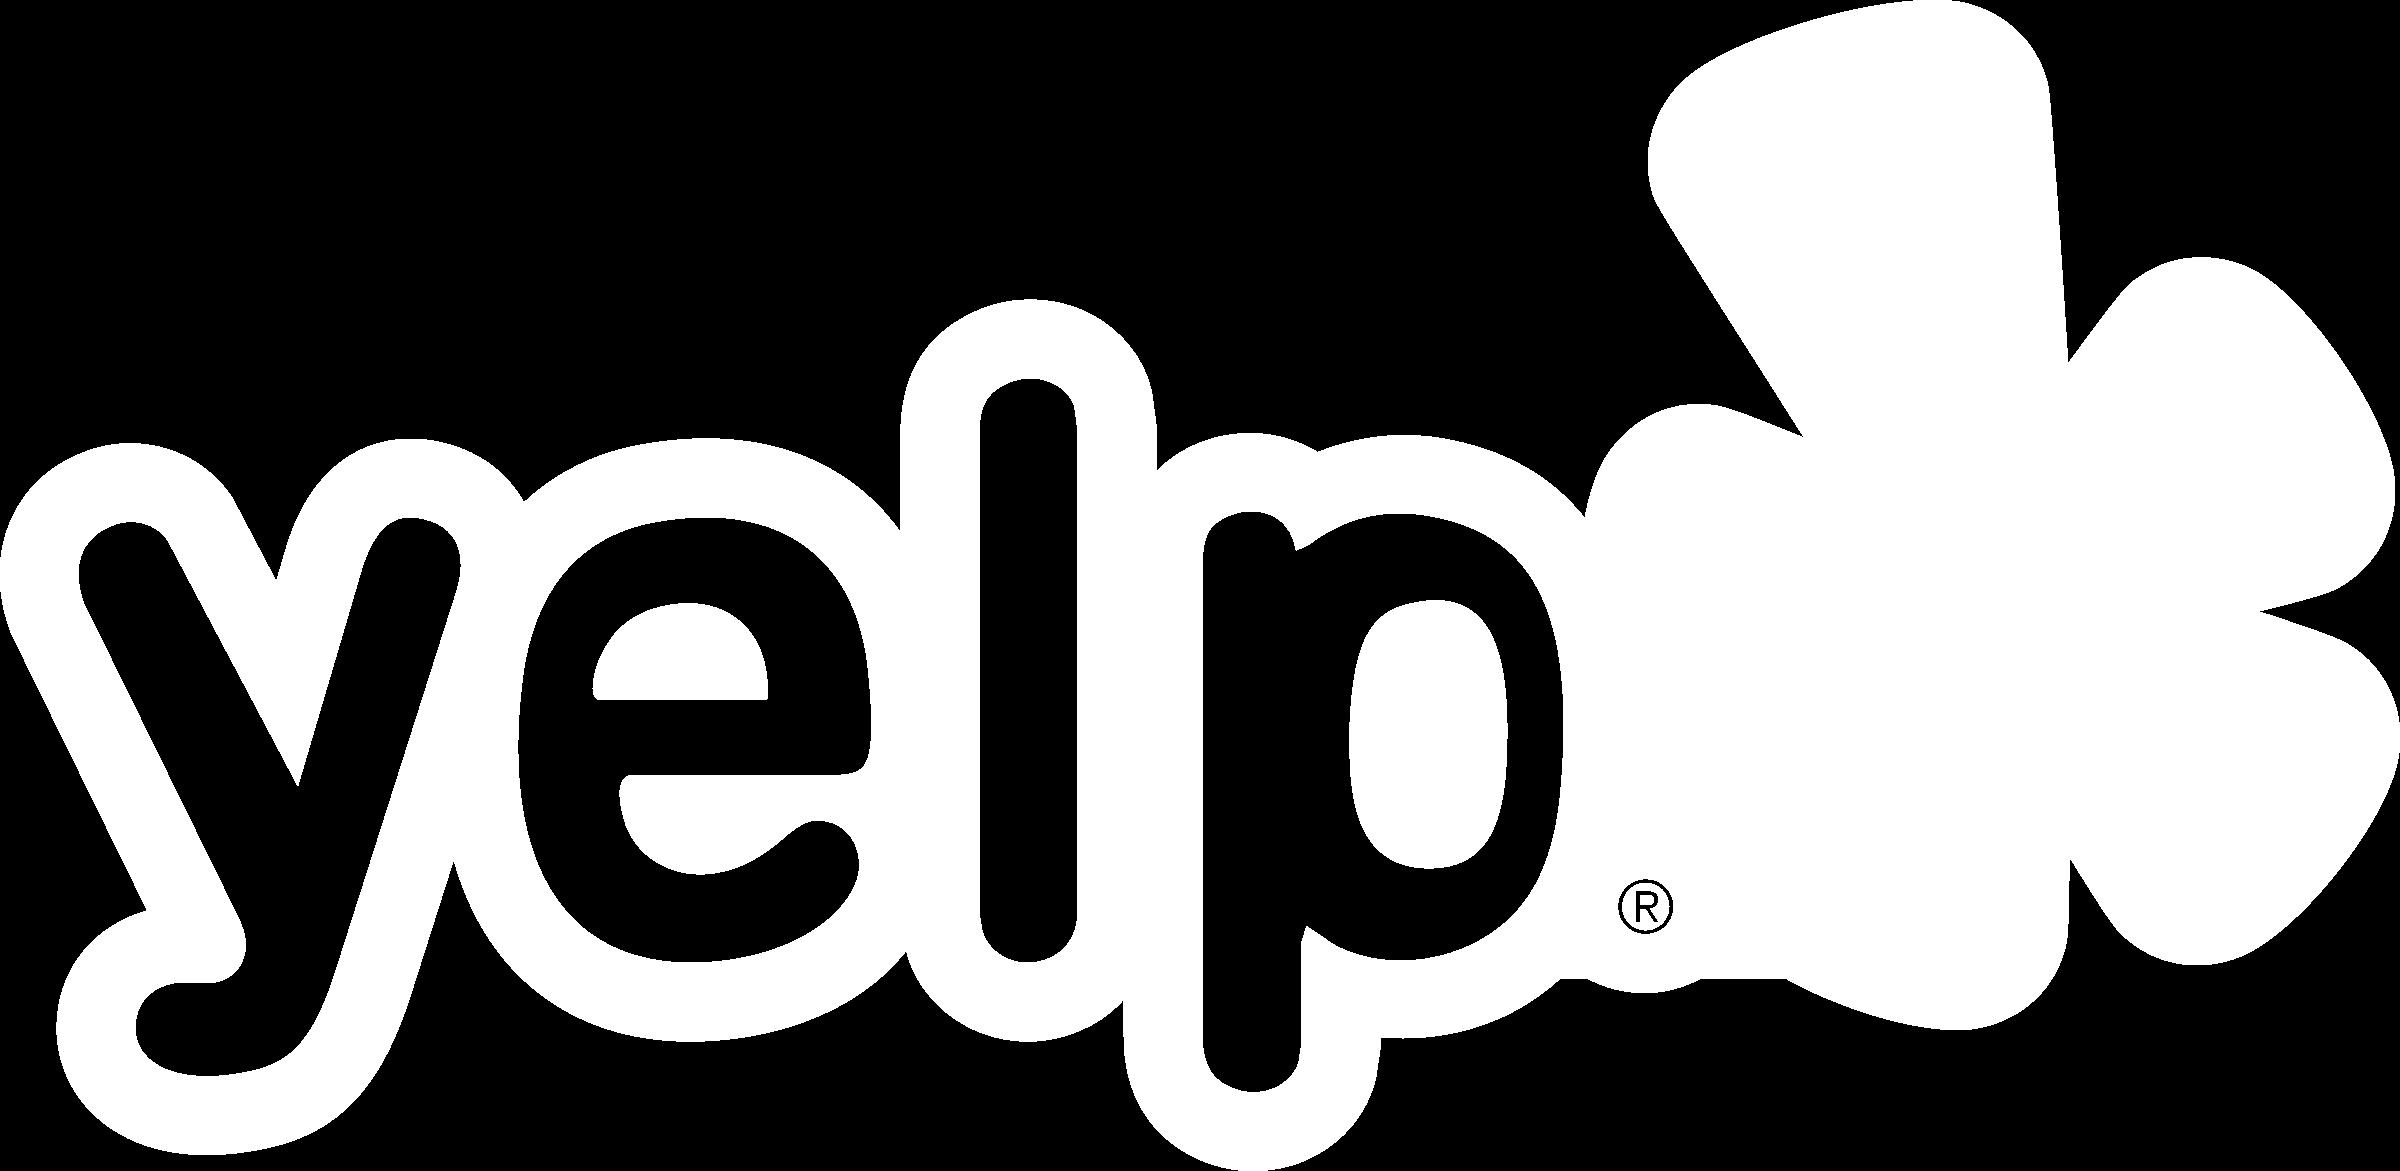 yelp logo png transparent svg vector freebie supply rh freebiesupply com yelp logo images yelp logo history